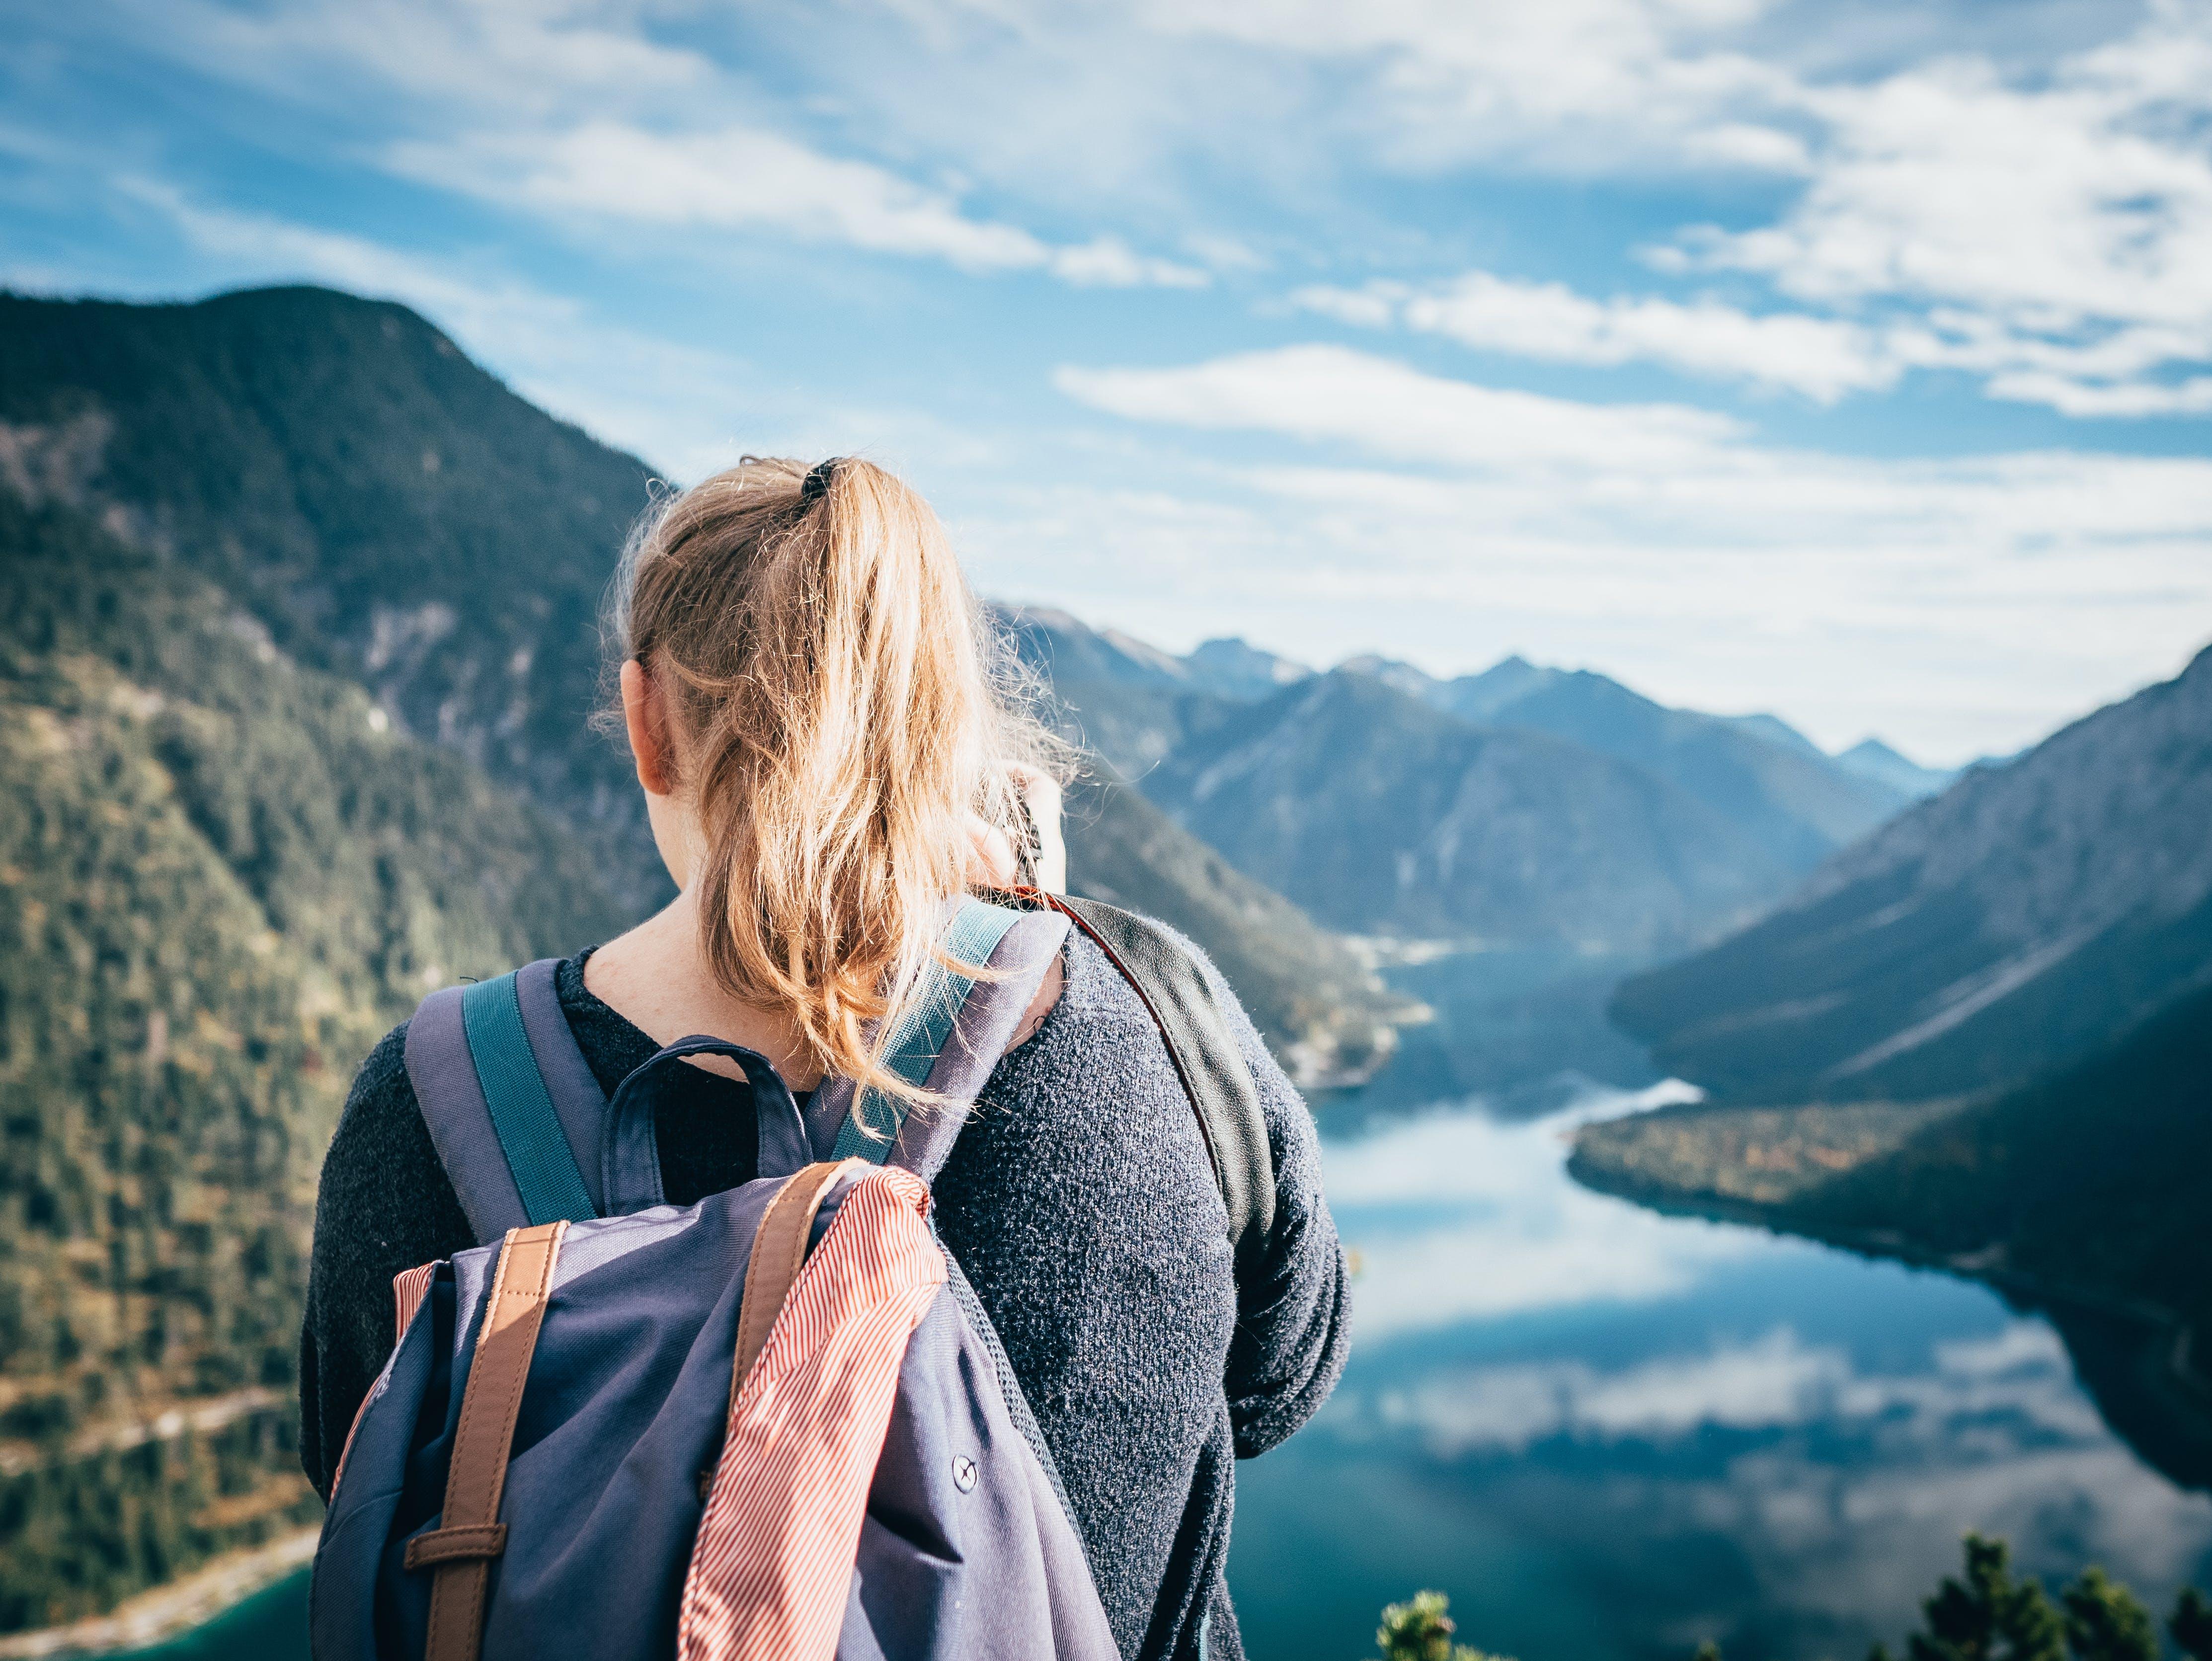 Kostenloses Stock Foto zu landschaft, natur, himmel, person